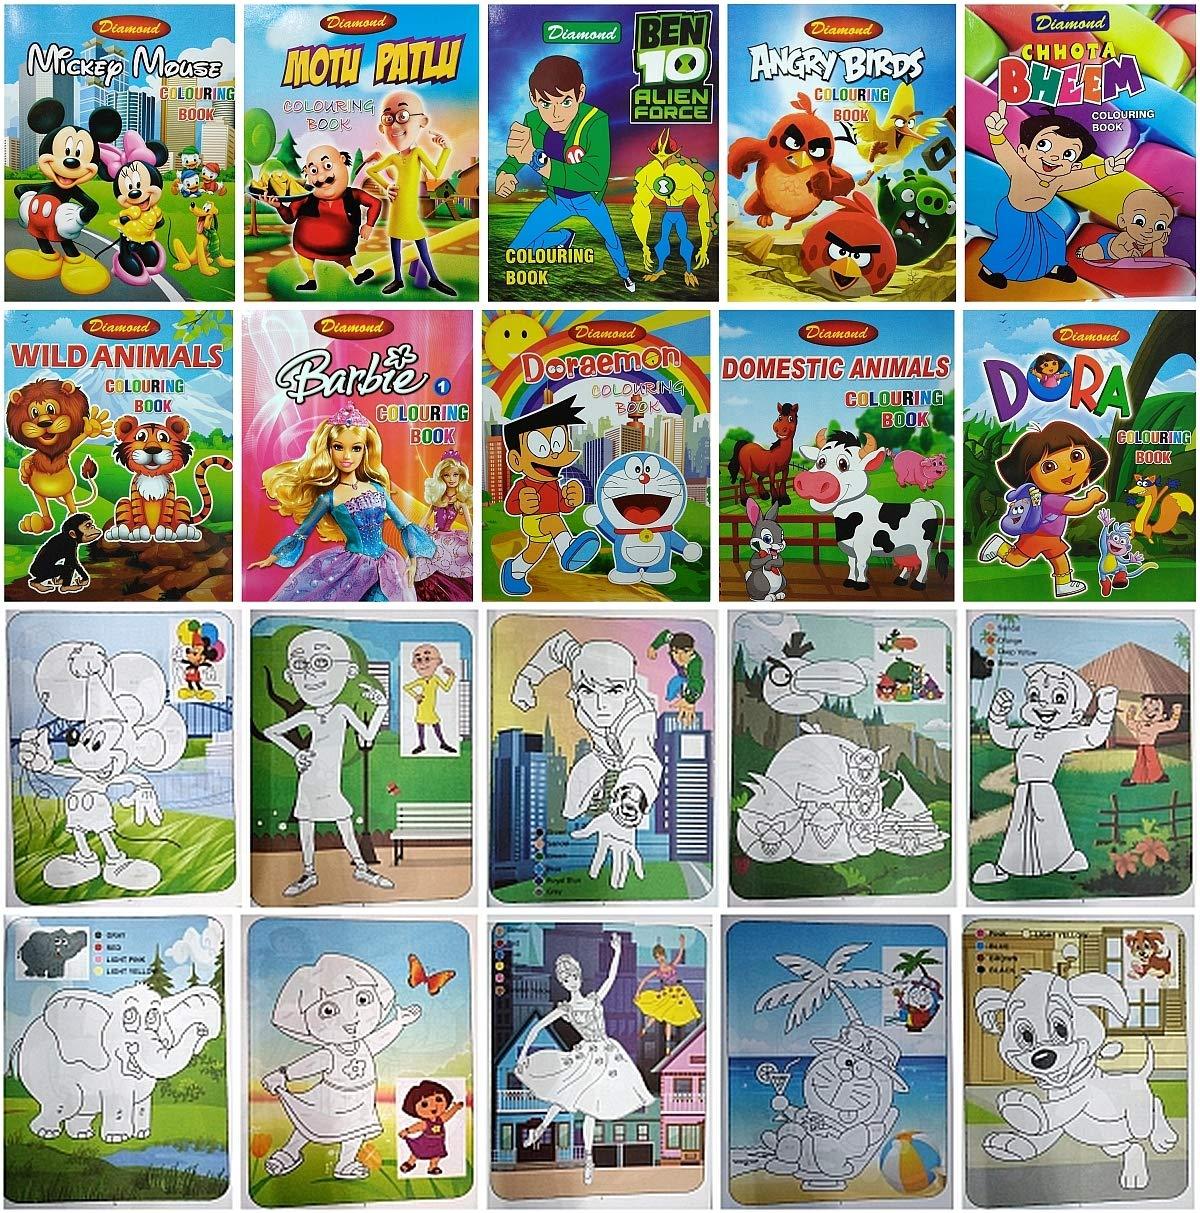 5000 Chota Bheem Coloring Book Games Best HD